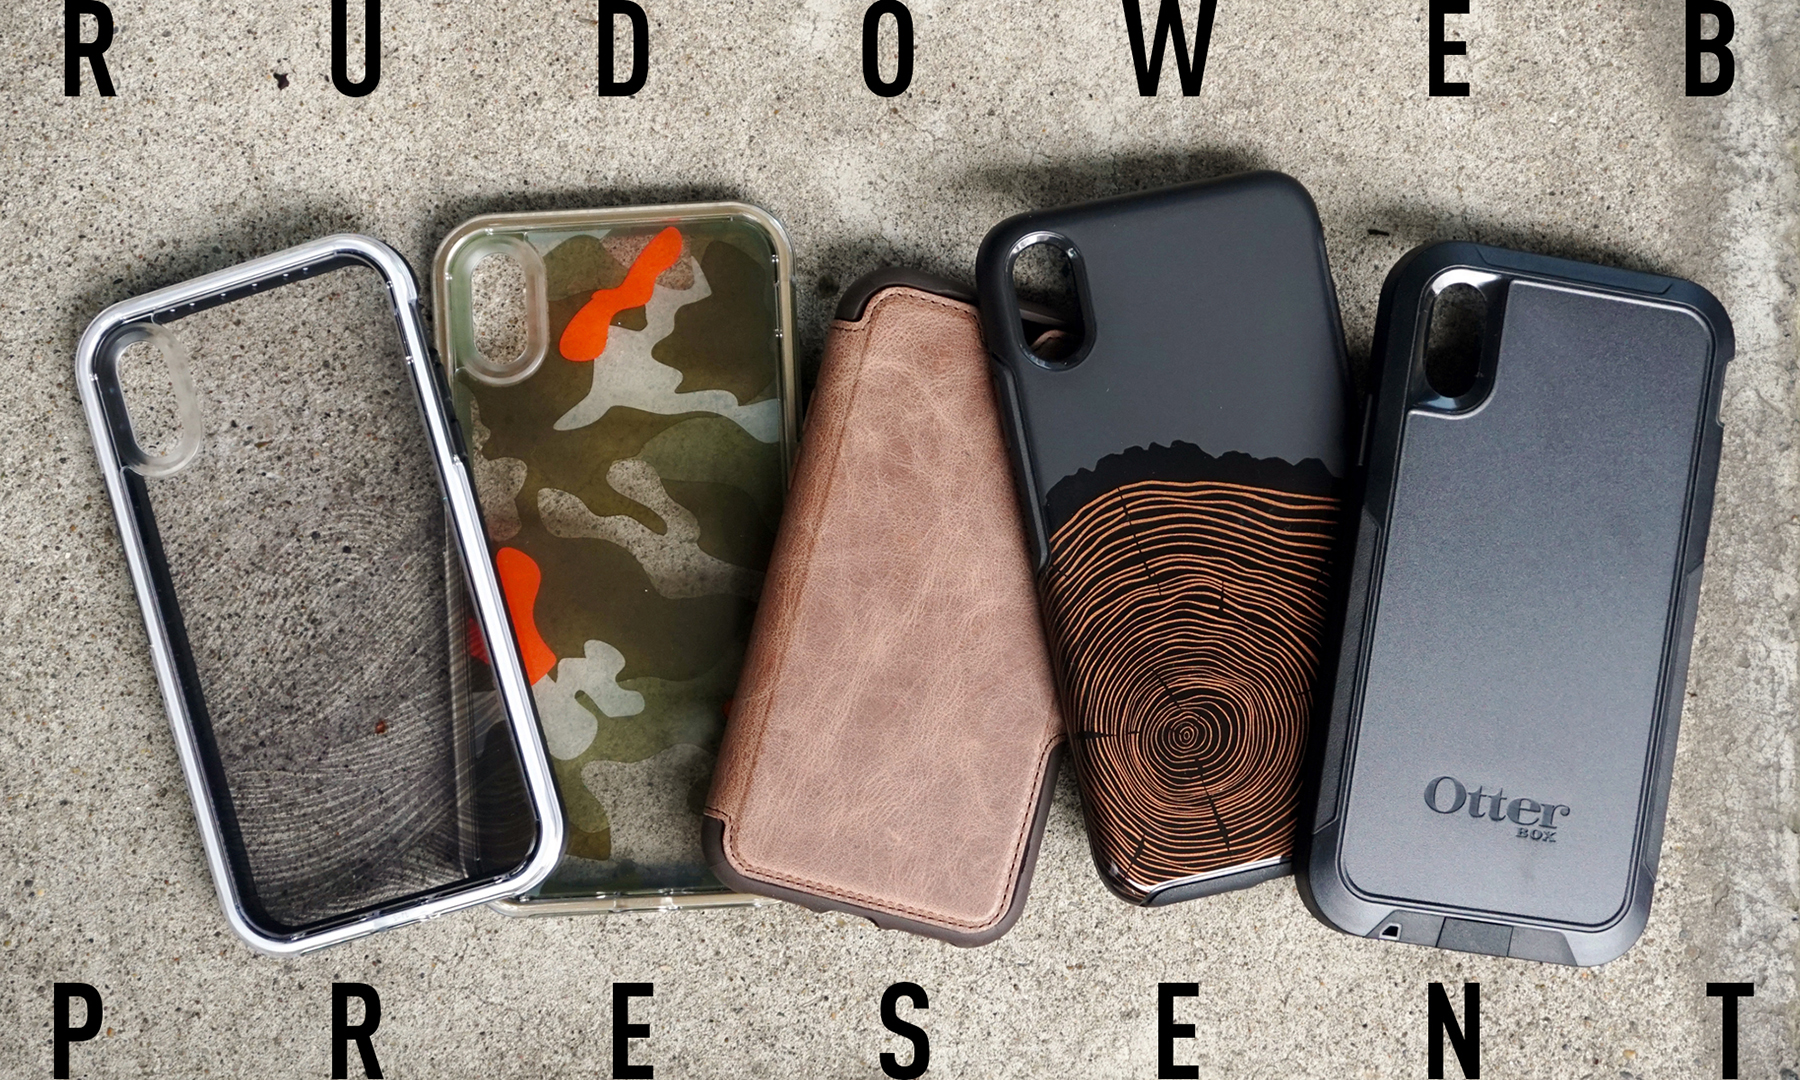 【RUDO WEB PRESENT】各1名様にプレゼント アメリカが認めたタフなiPhoneケース「OtterBox & LIFEPROOF」